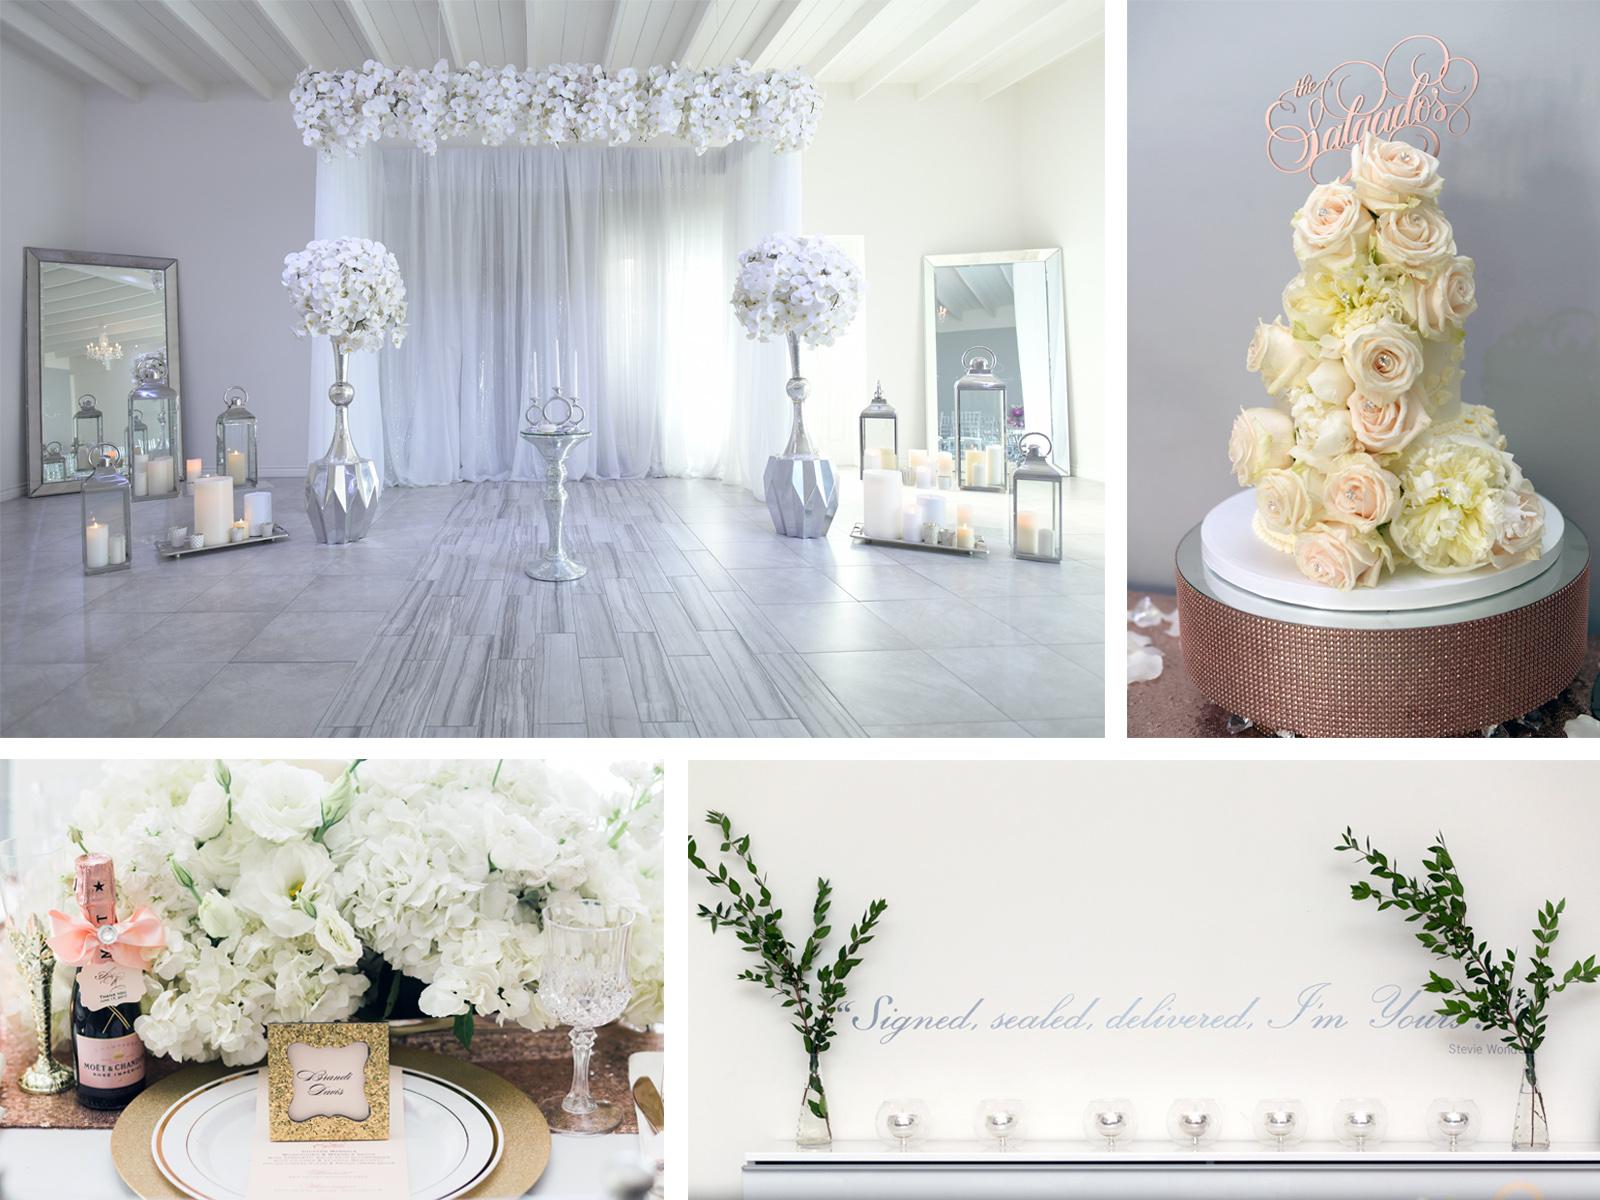 Homepage albertson wedding chapel on la bre ave and wilshire blvd los angeles